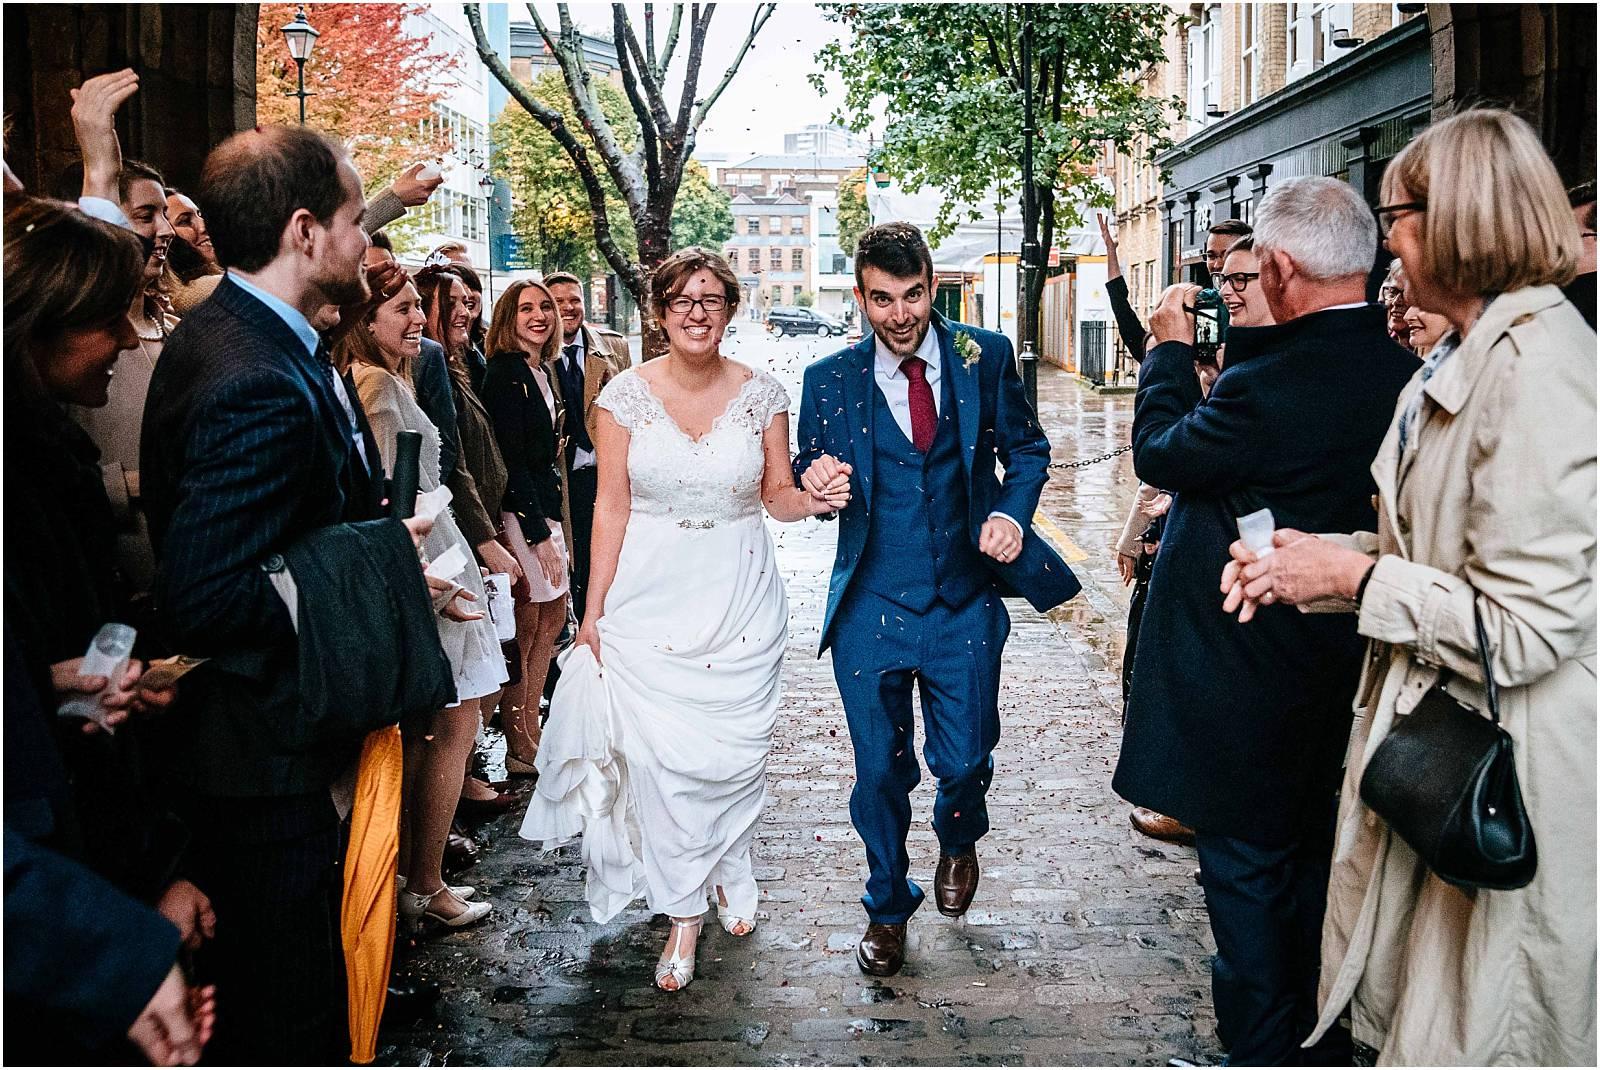 St Etheldreda's Crypt Wedding Photography – Jackie & Alex's London wedding